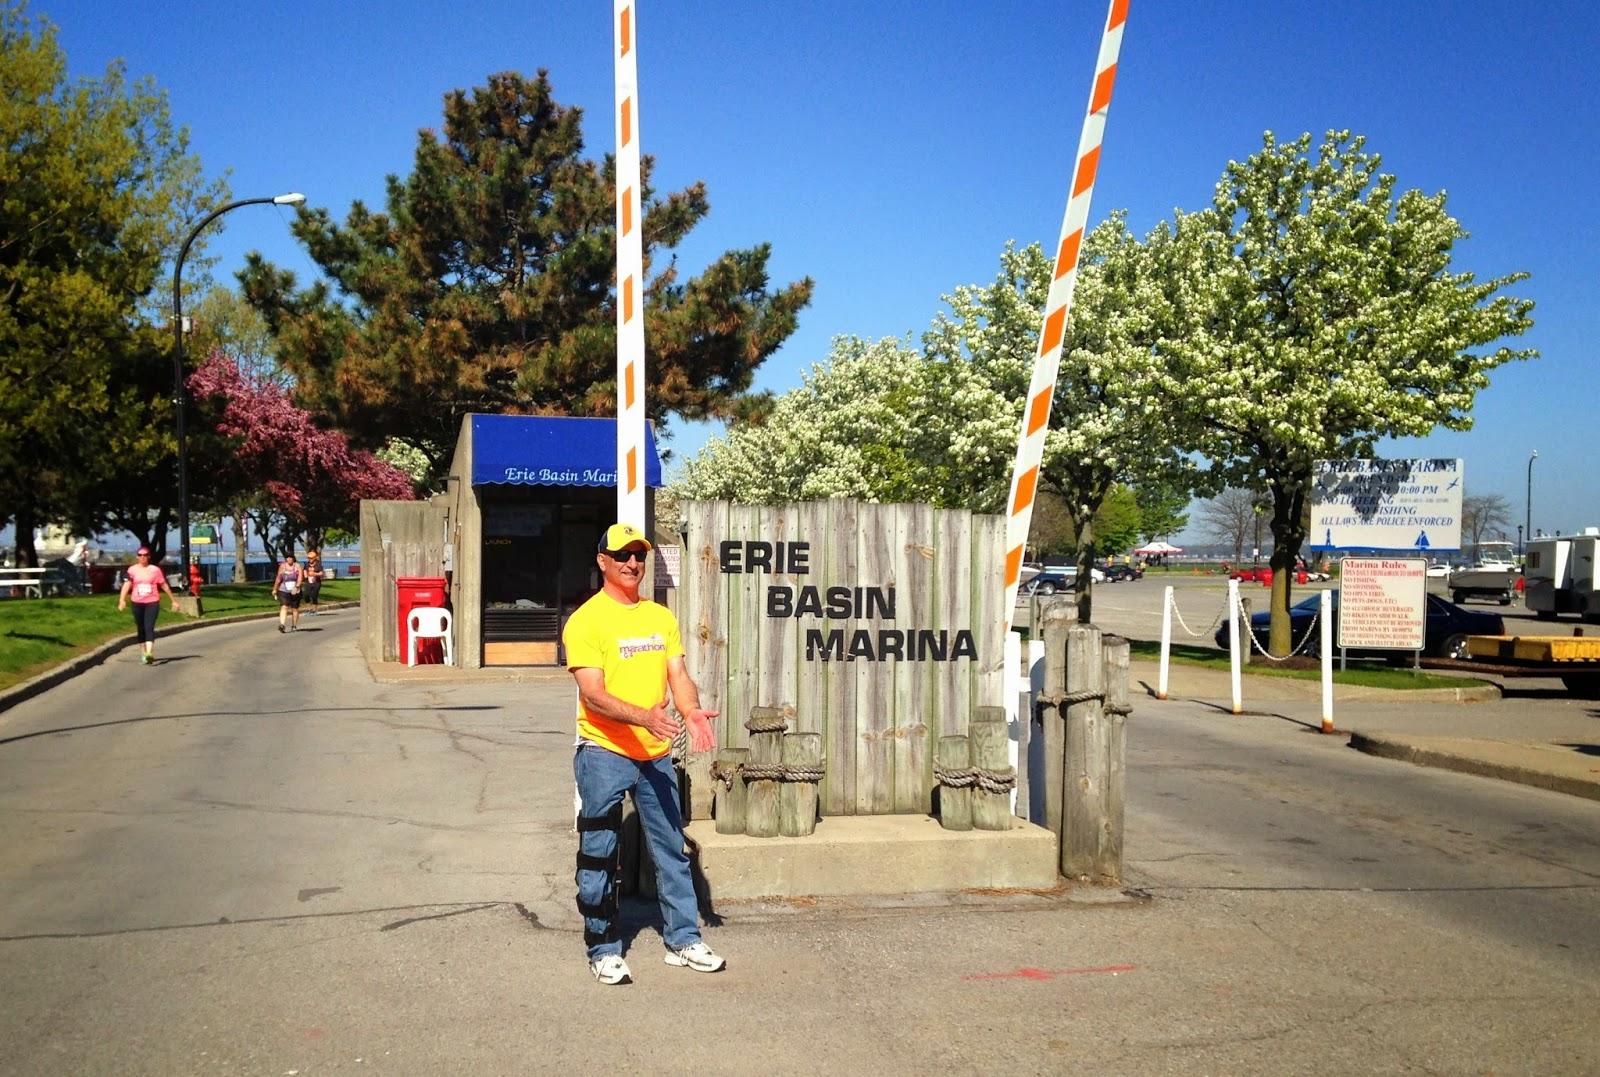 Erie Basin Marina, Running Free, RunningFree.com, Damaged Hearts, Heart & Stroke